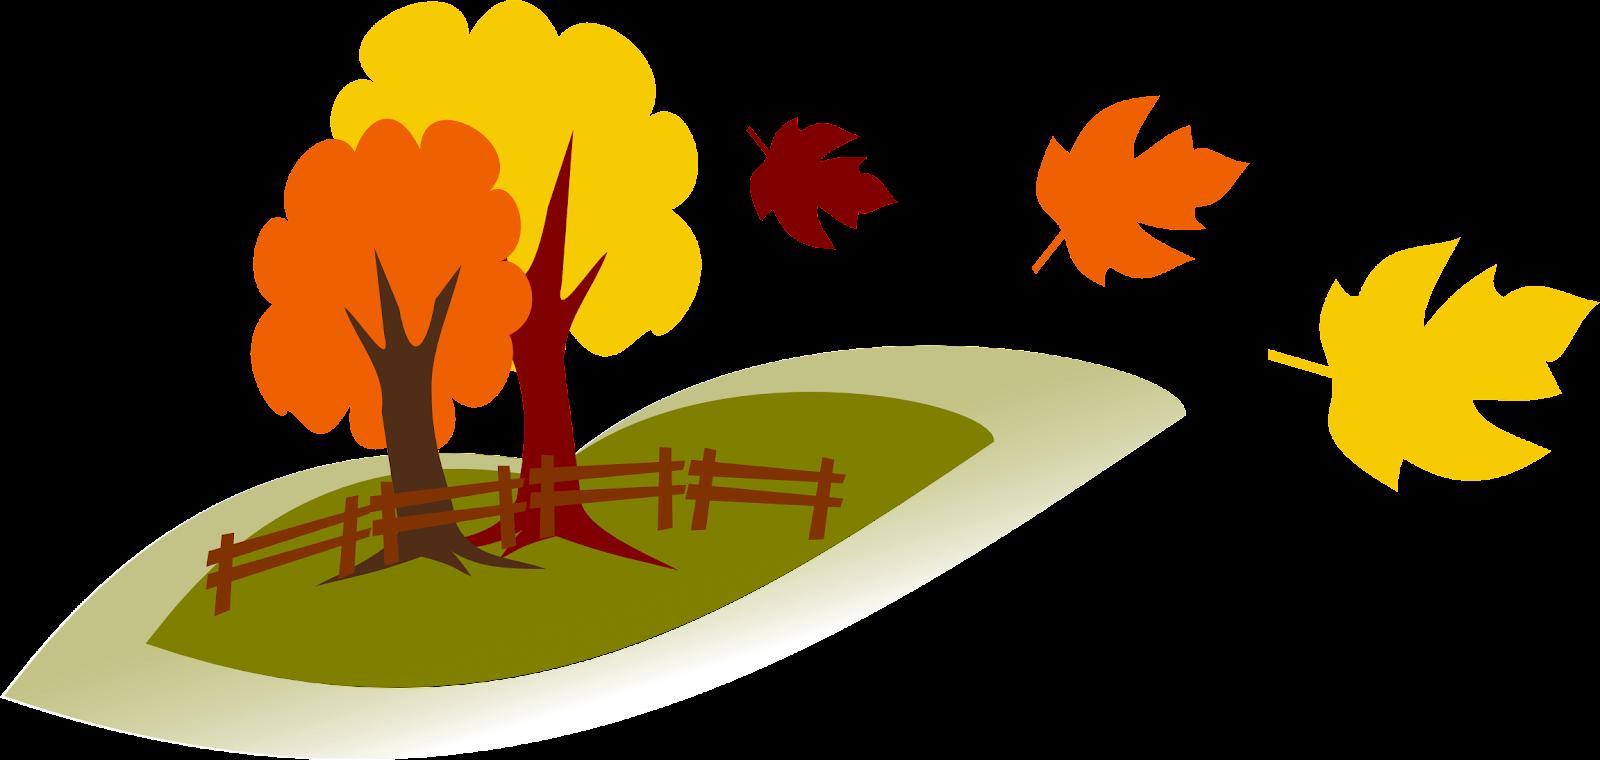 fall tree losing leaves